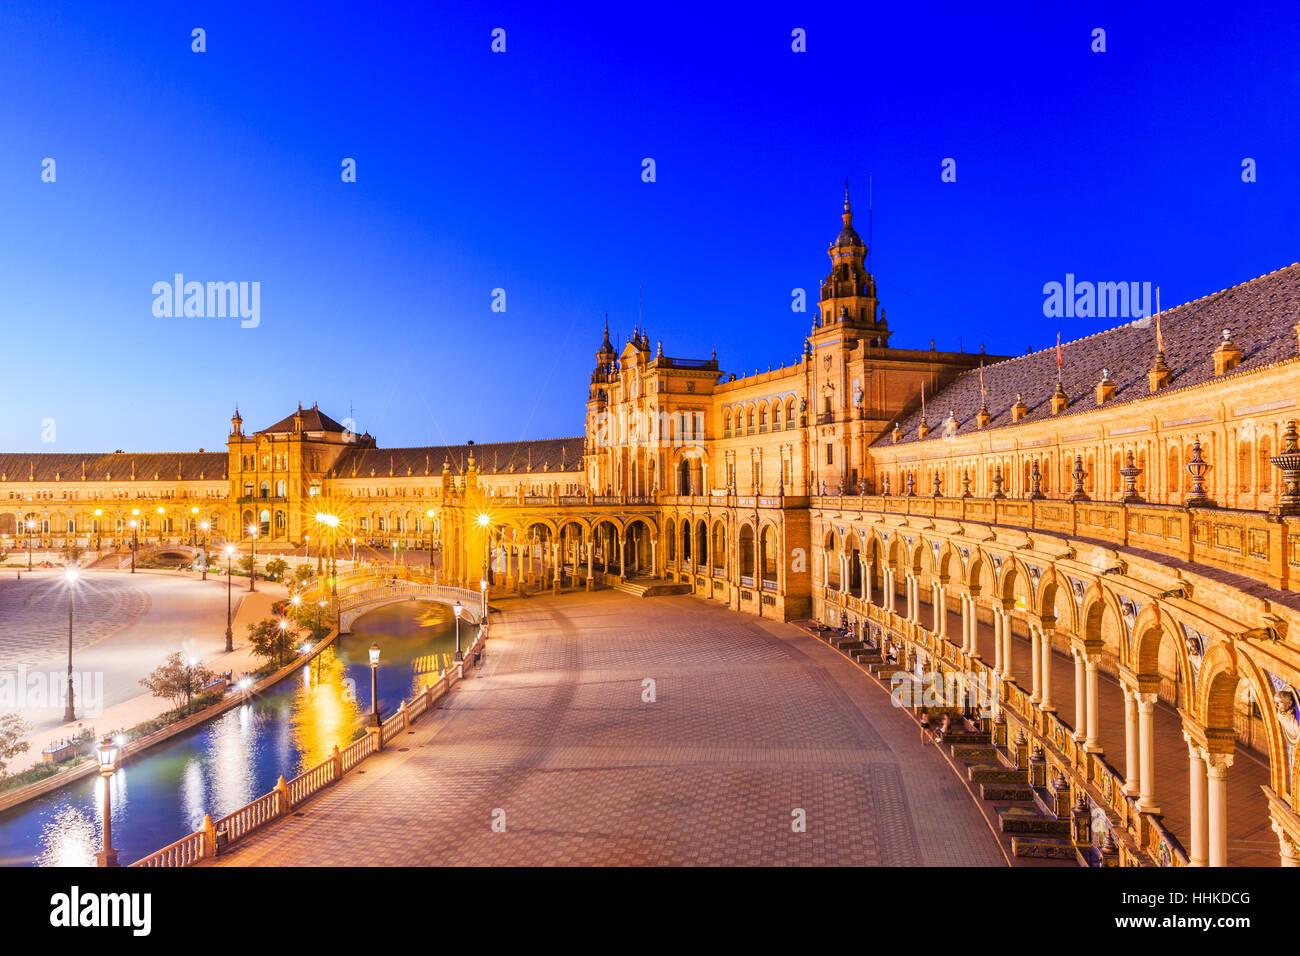 Seville, Spain. Spanish Square. - Stock Image